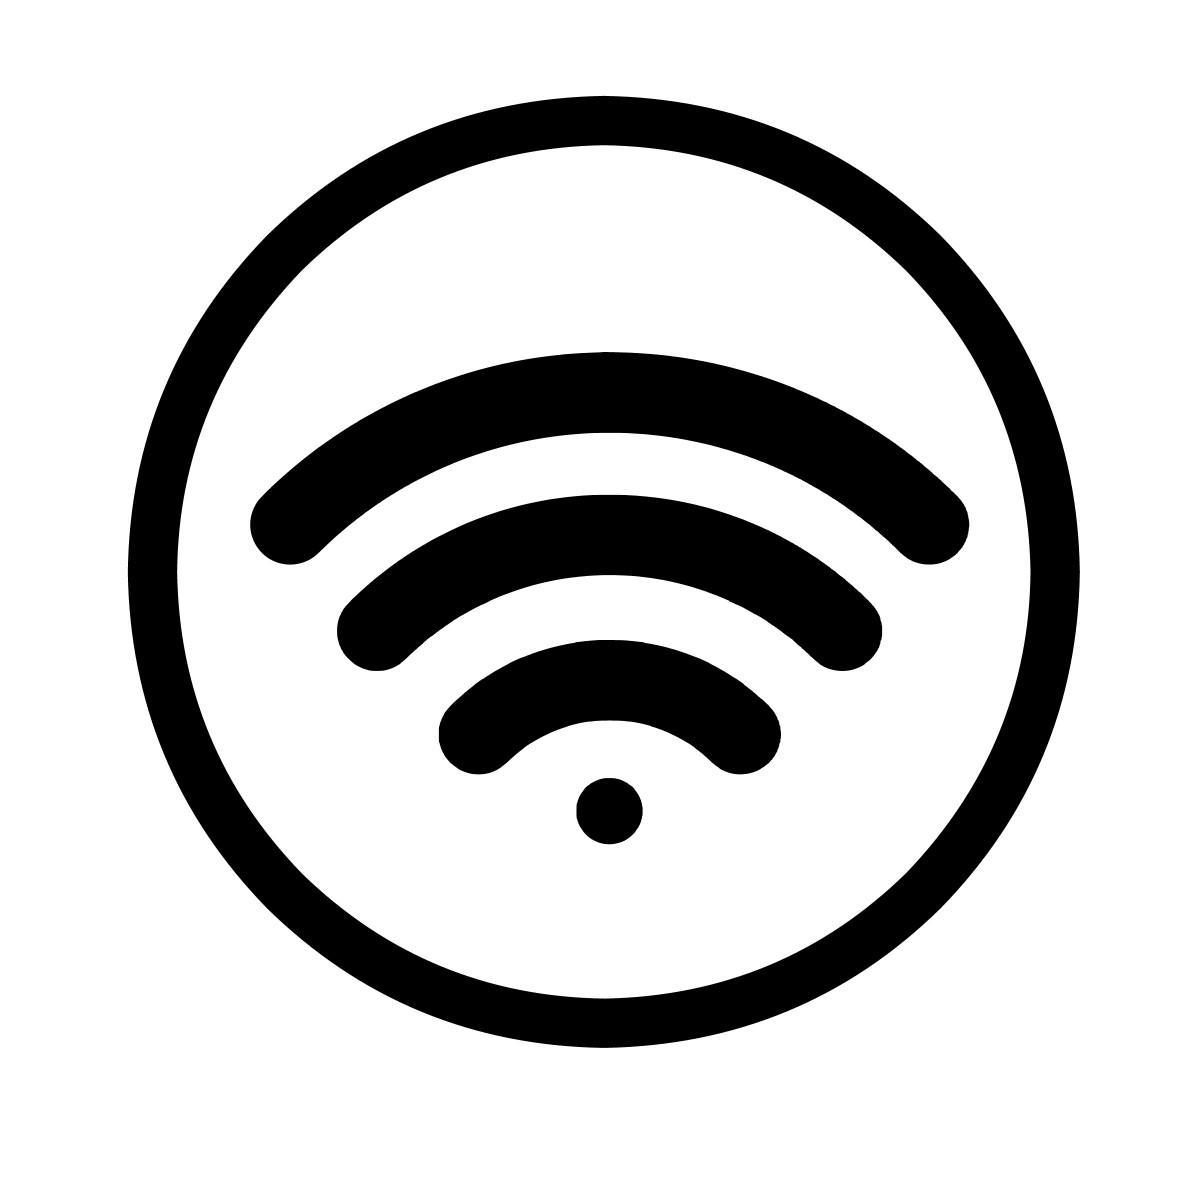 nirkabel koneksi Wifi sinyal icon Internet tanda jaringan jaringan router wi antena hotspot fi teknologi radio menghubungkan titik gelombang digital komunikasi tombol daerah transmisi global hitam dan putih lingkaran garis daerah fon simbol clip art grafis